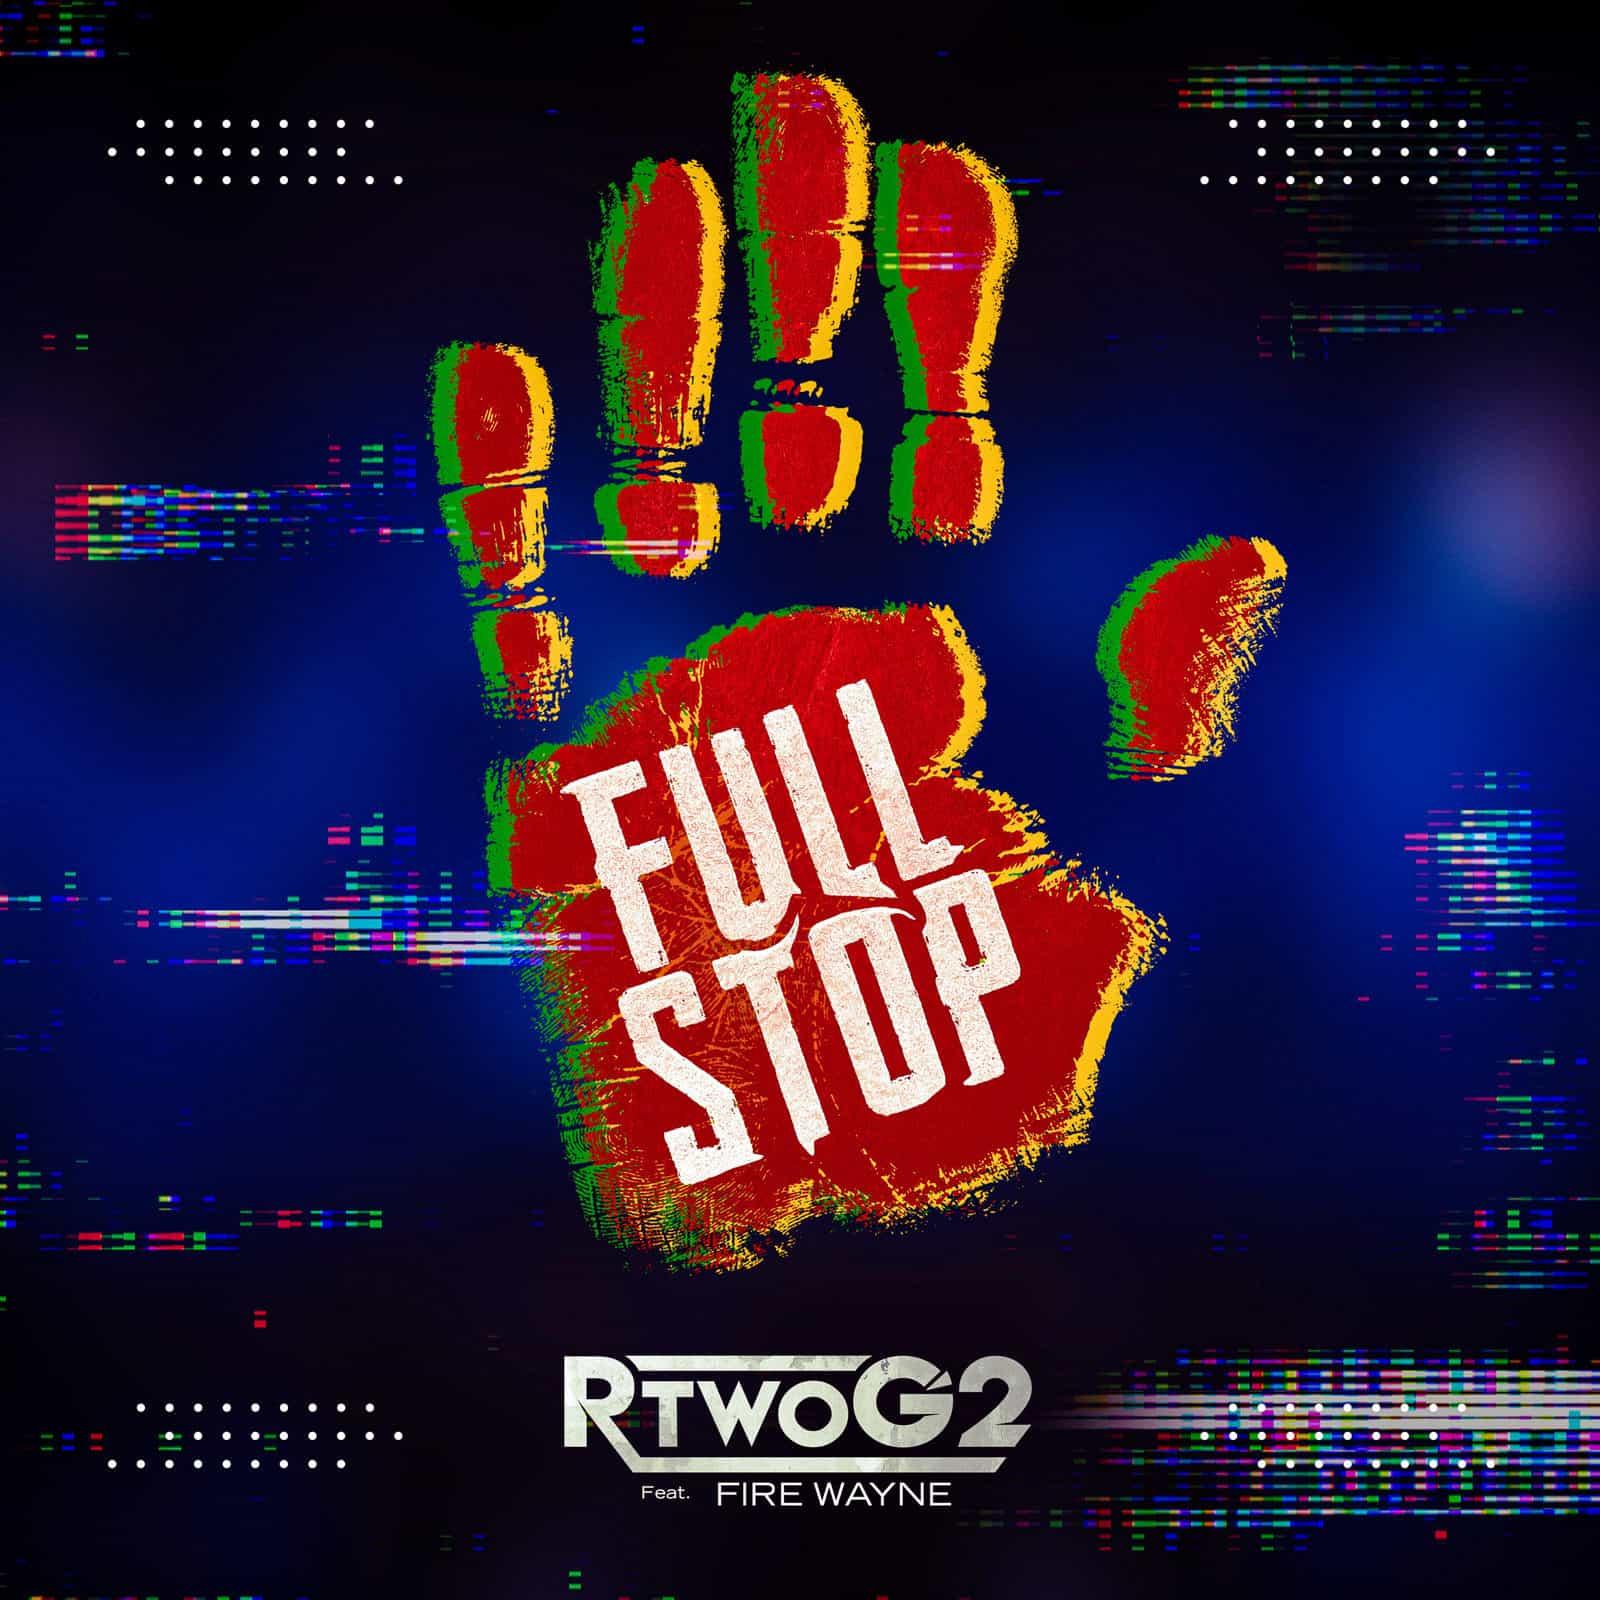 Full Stop - RTwoG2 (feat. Fire Wayne)